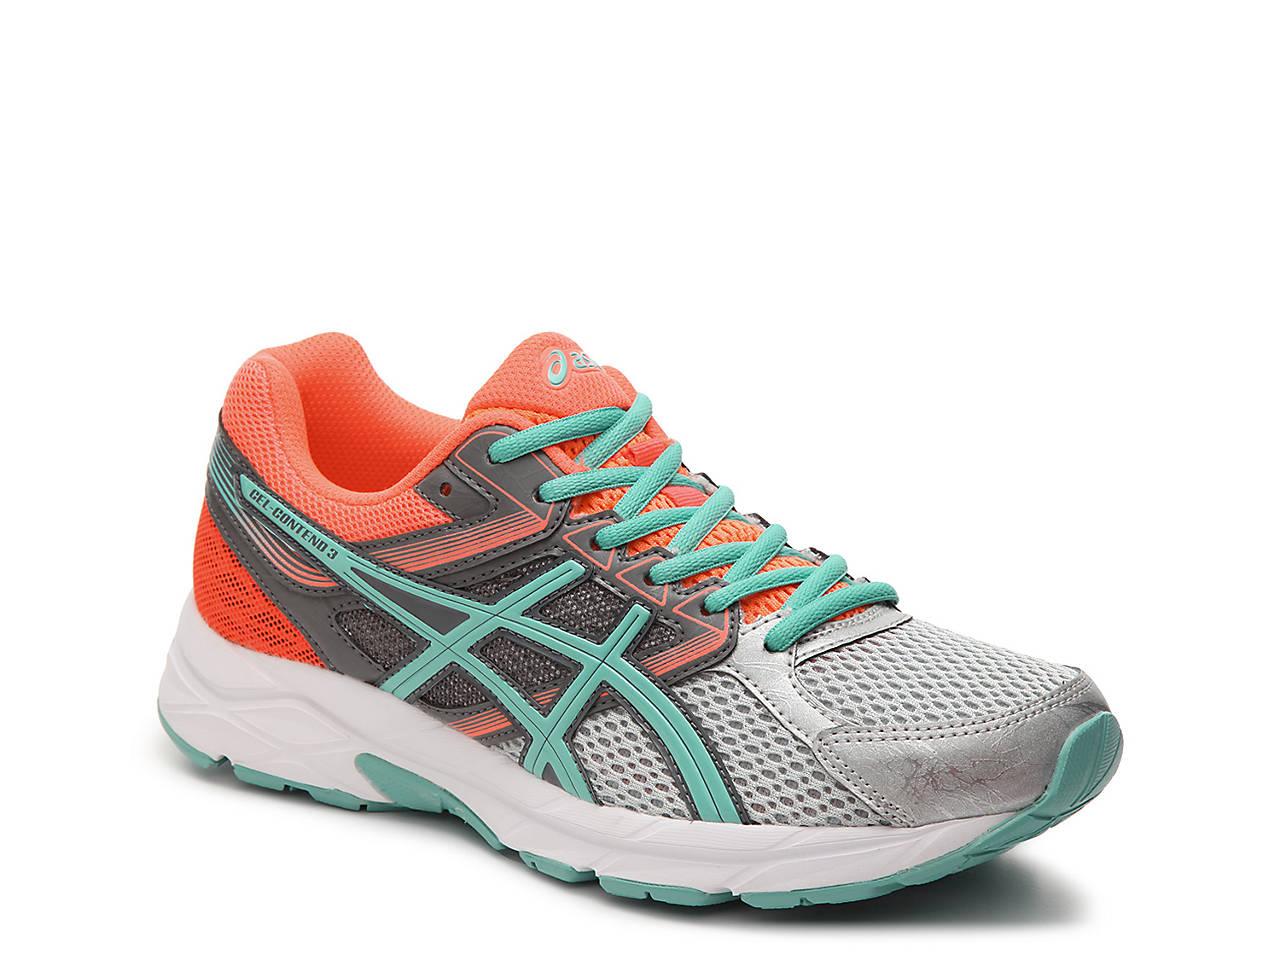 GEL-Contend 3 Running Shoe - Women's